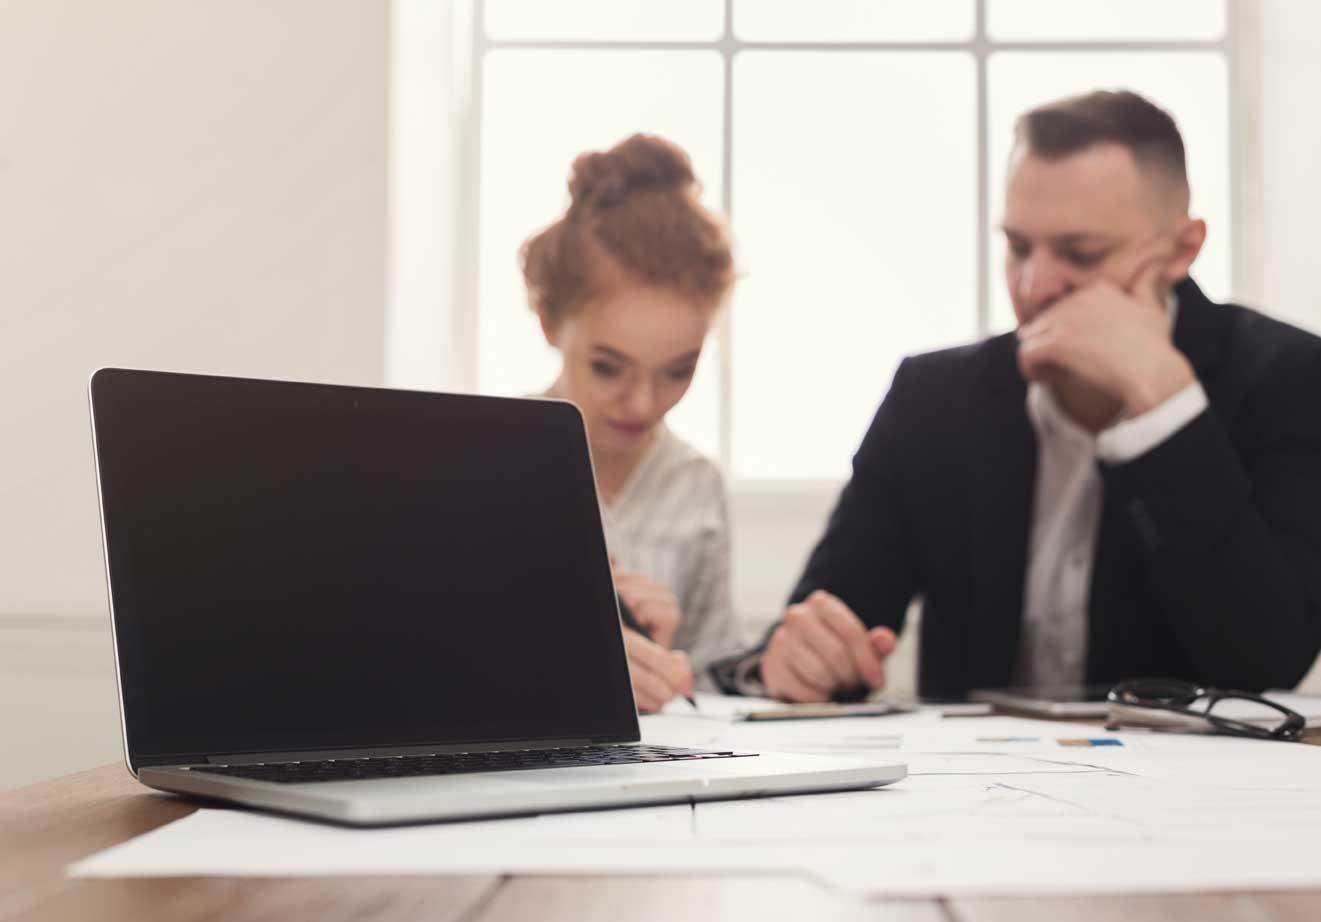 Unlawful vs. Wrongful Dismissal